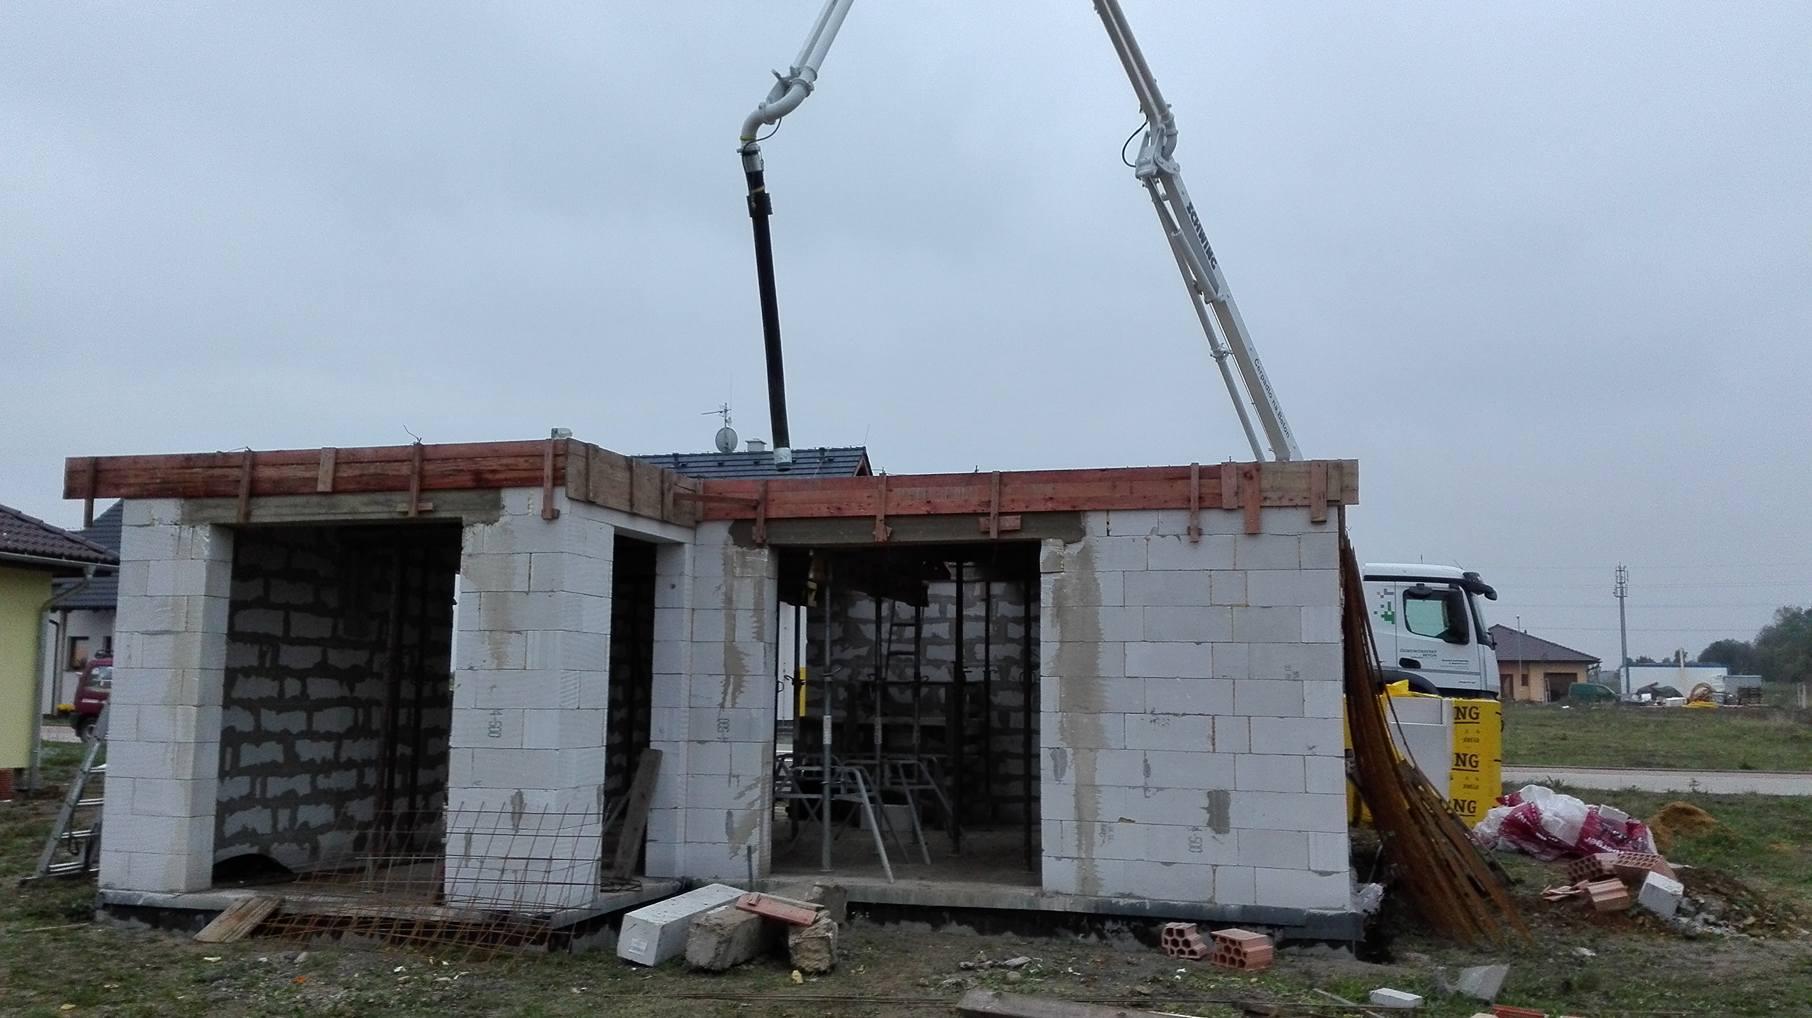 Stavba domu na kraji Prahy - Už to lijí betonem. To bude!